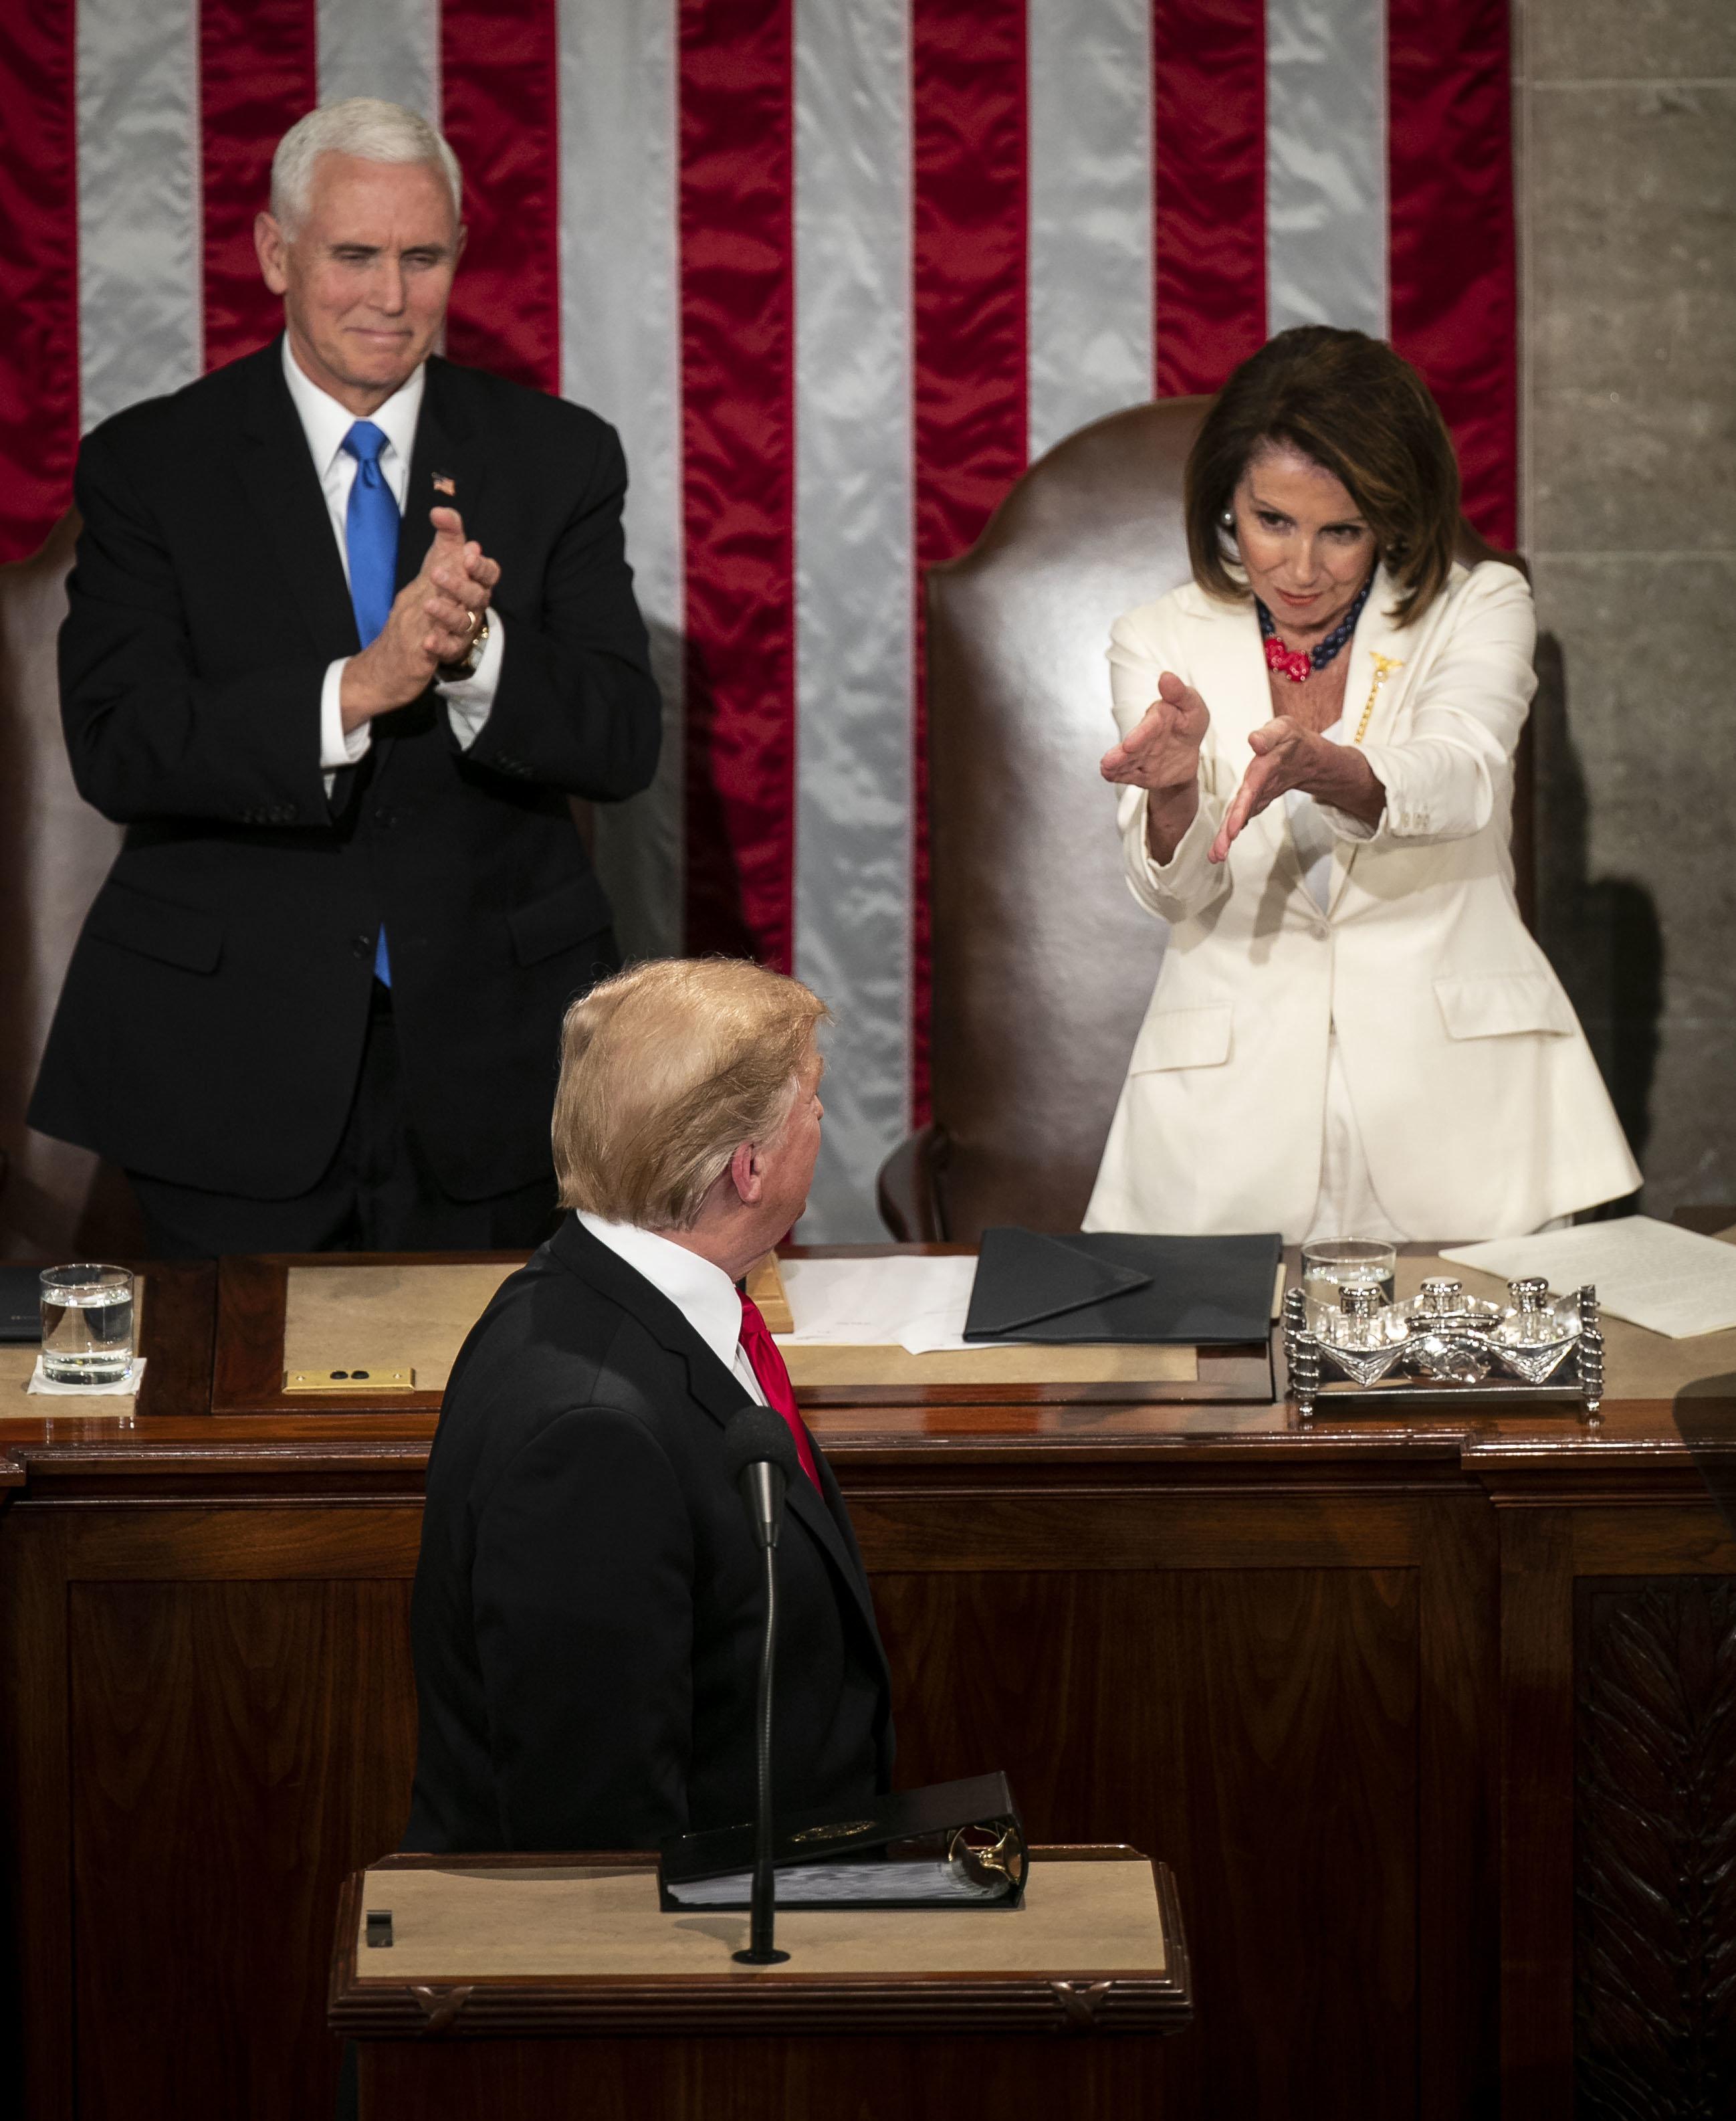 Nancy Pelosi's Daughter Jokes That Infamous Clap At Trump Took Her Back To Teen